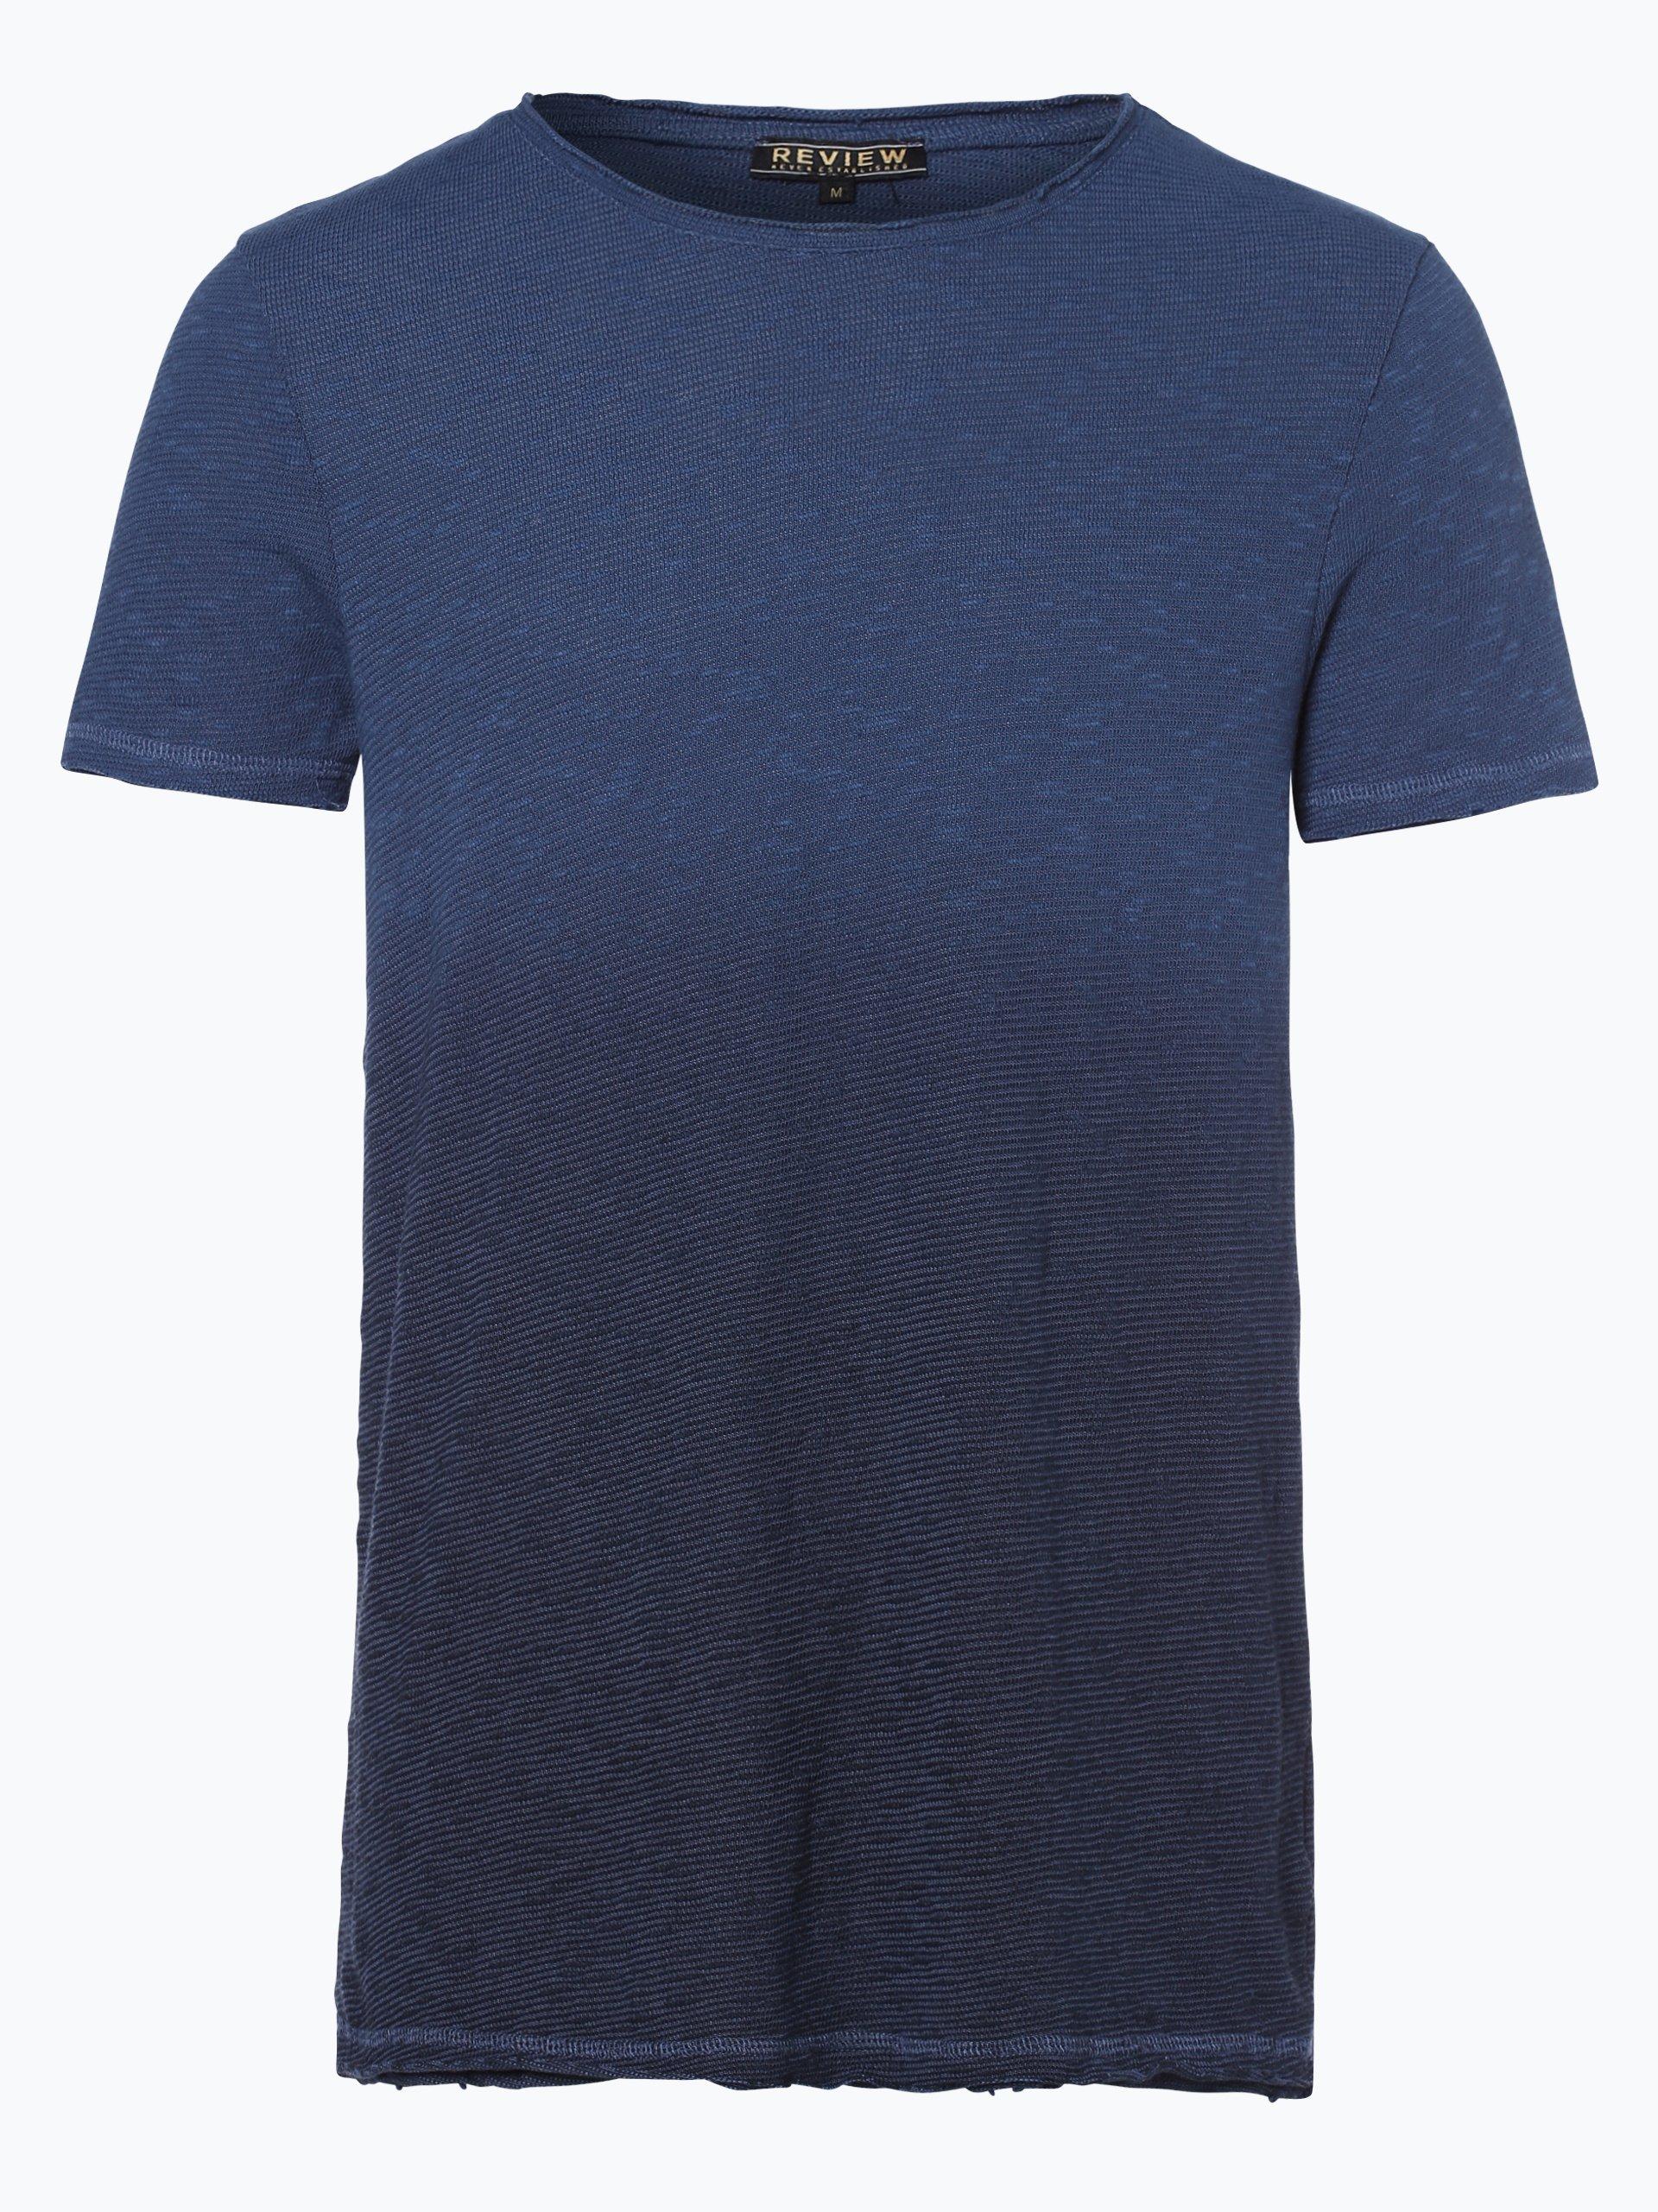 review herren t shirt marine uni online kaufen vangraaf com. Black Bedroom Furniture Sets. Home Design Ideas